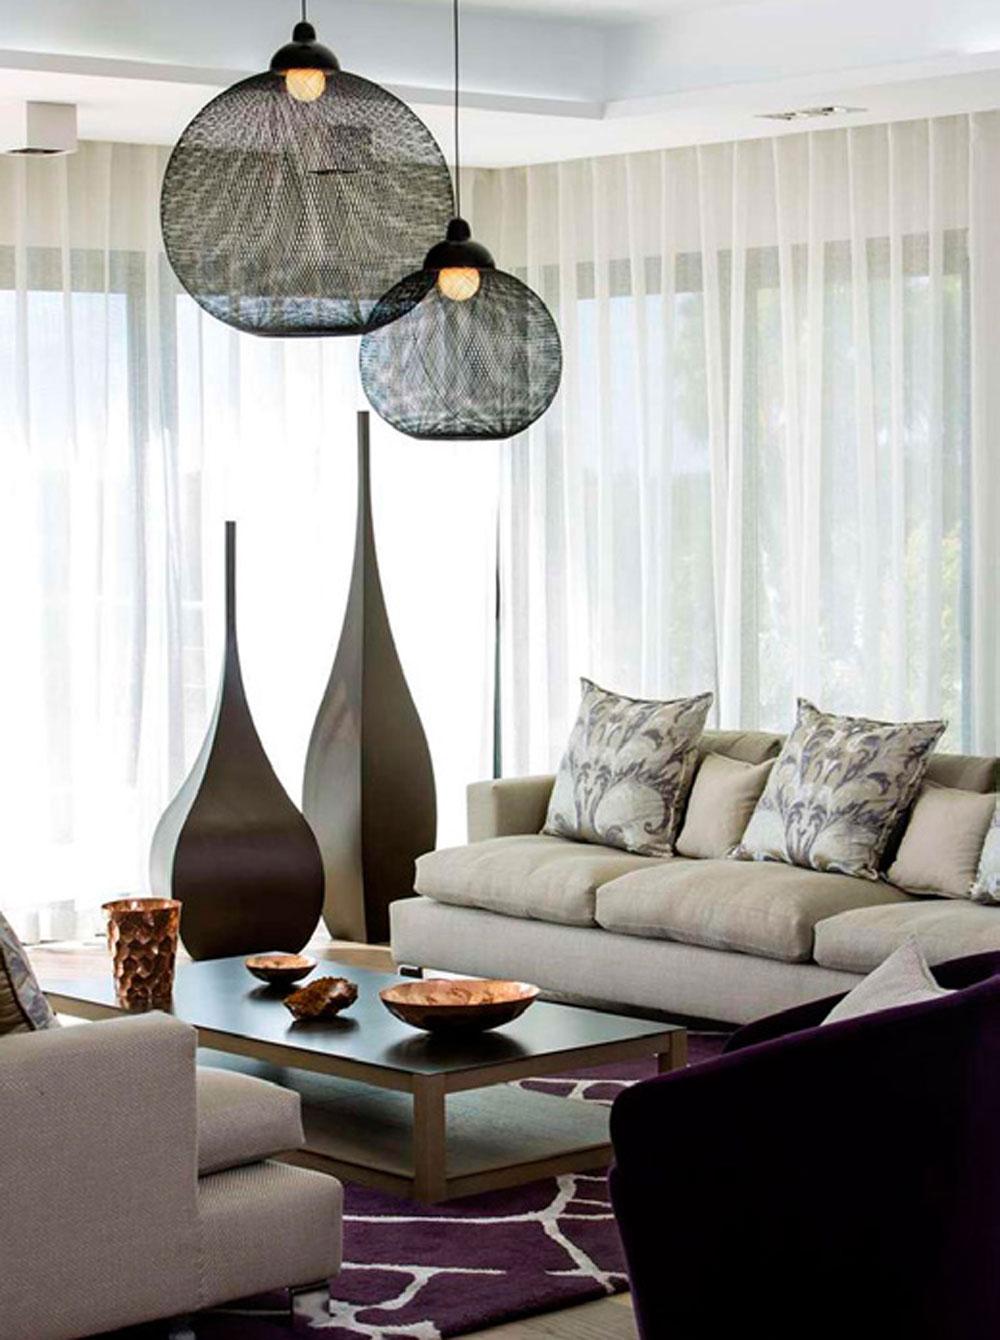 Wood Interior Decoration Home Design Ideas 3 Wood Interior Decoration Home Design Ideas